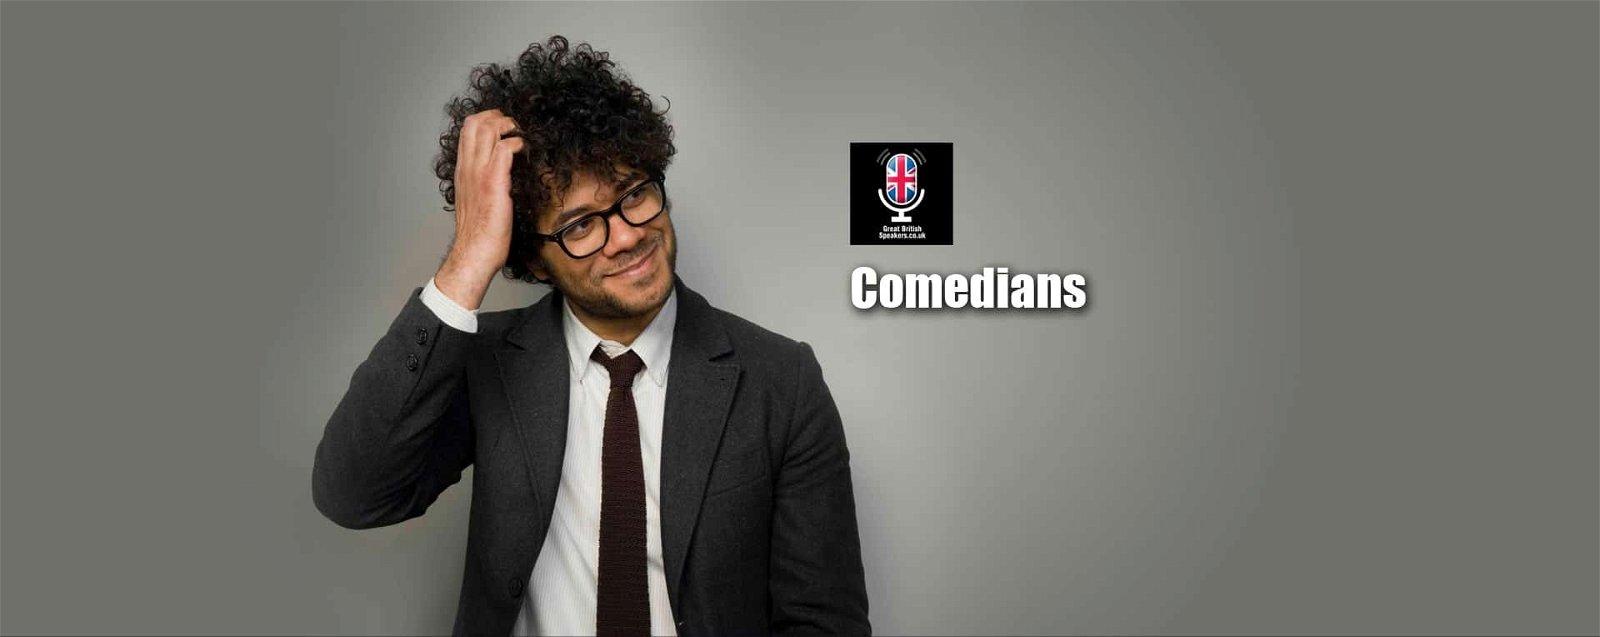 Comedians Slider Great British Speakers-min